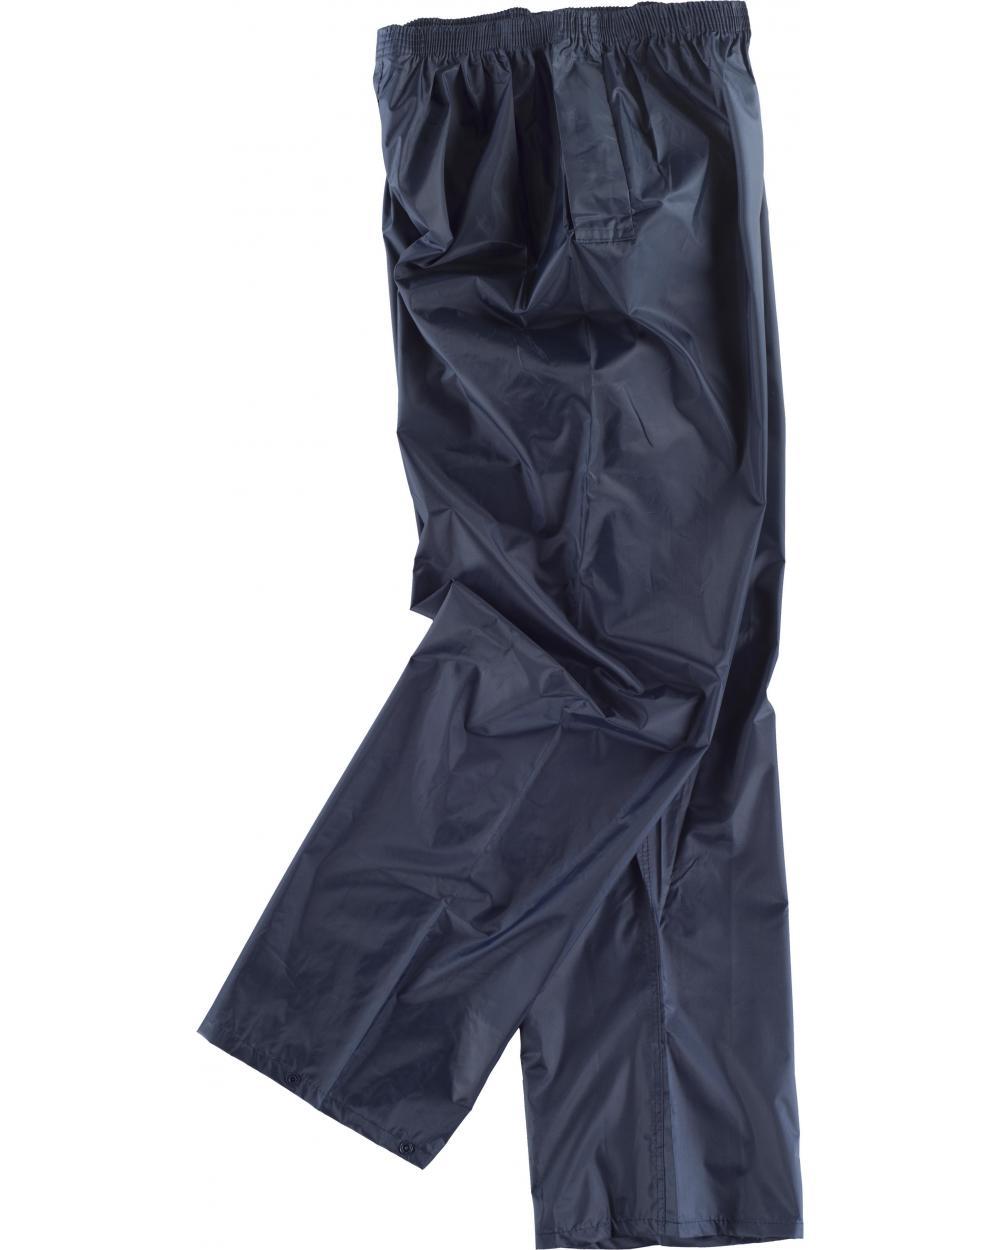 Comprar Pantalon chubasquero impermeable S2014 Marino workteam barato